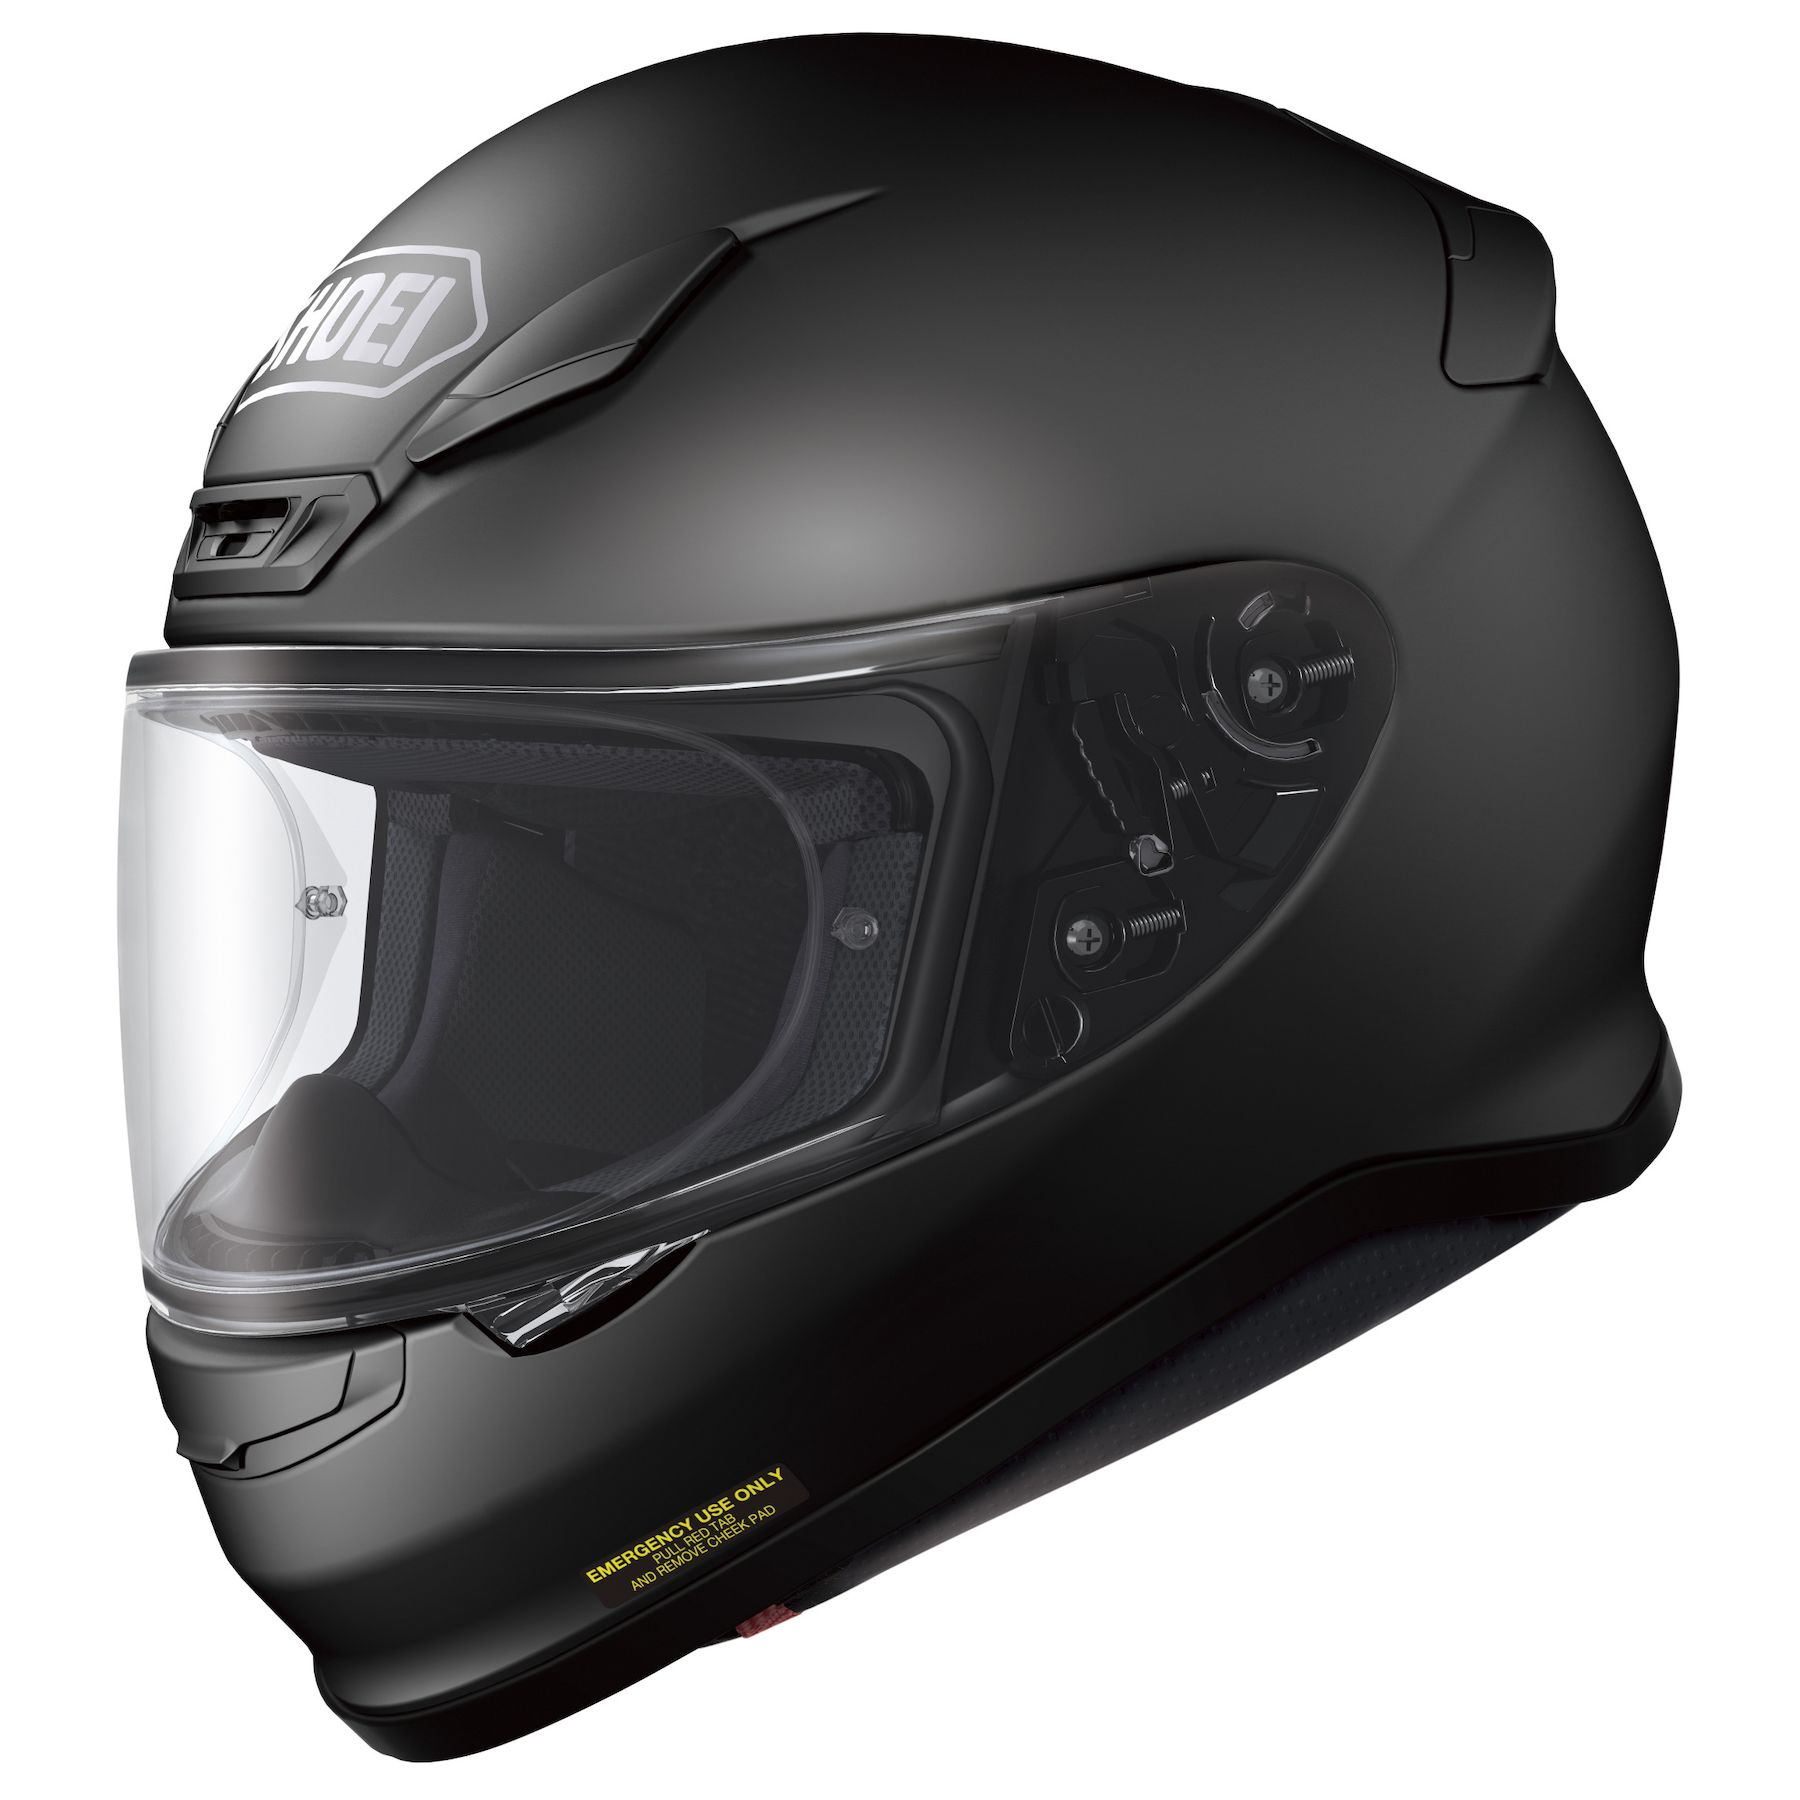 Schoei RF-1200 Solid full face helmet